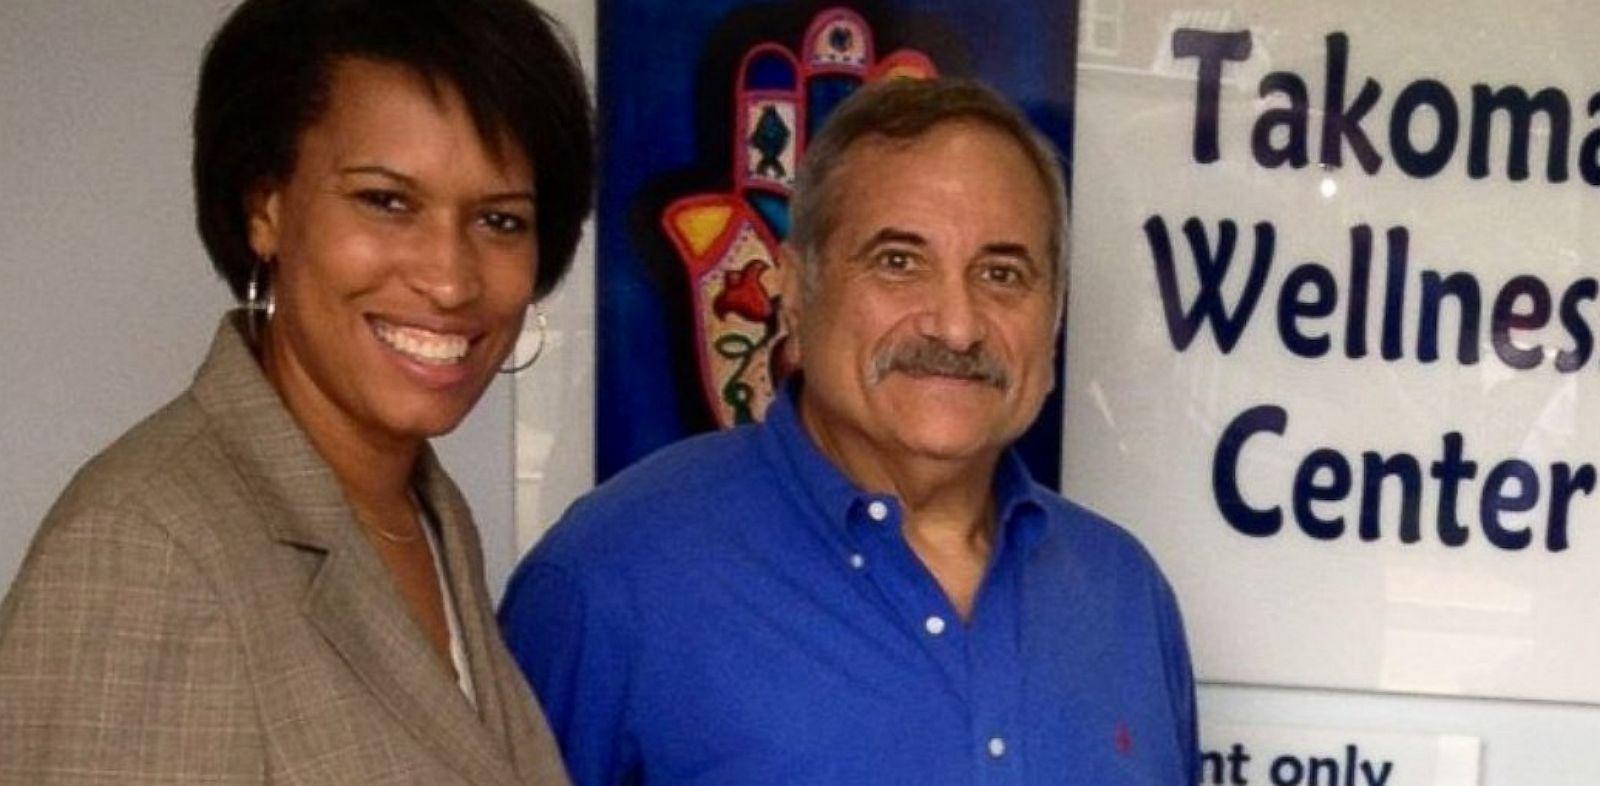 PHOTO: Rabbi Jeffrey Kahn with D.C. Council member Muriel Bowser at the Takoma Wellness Center.